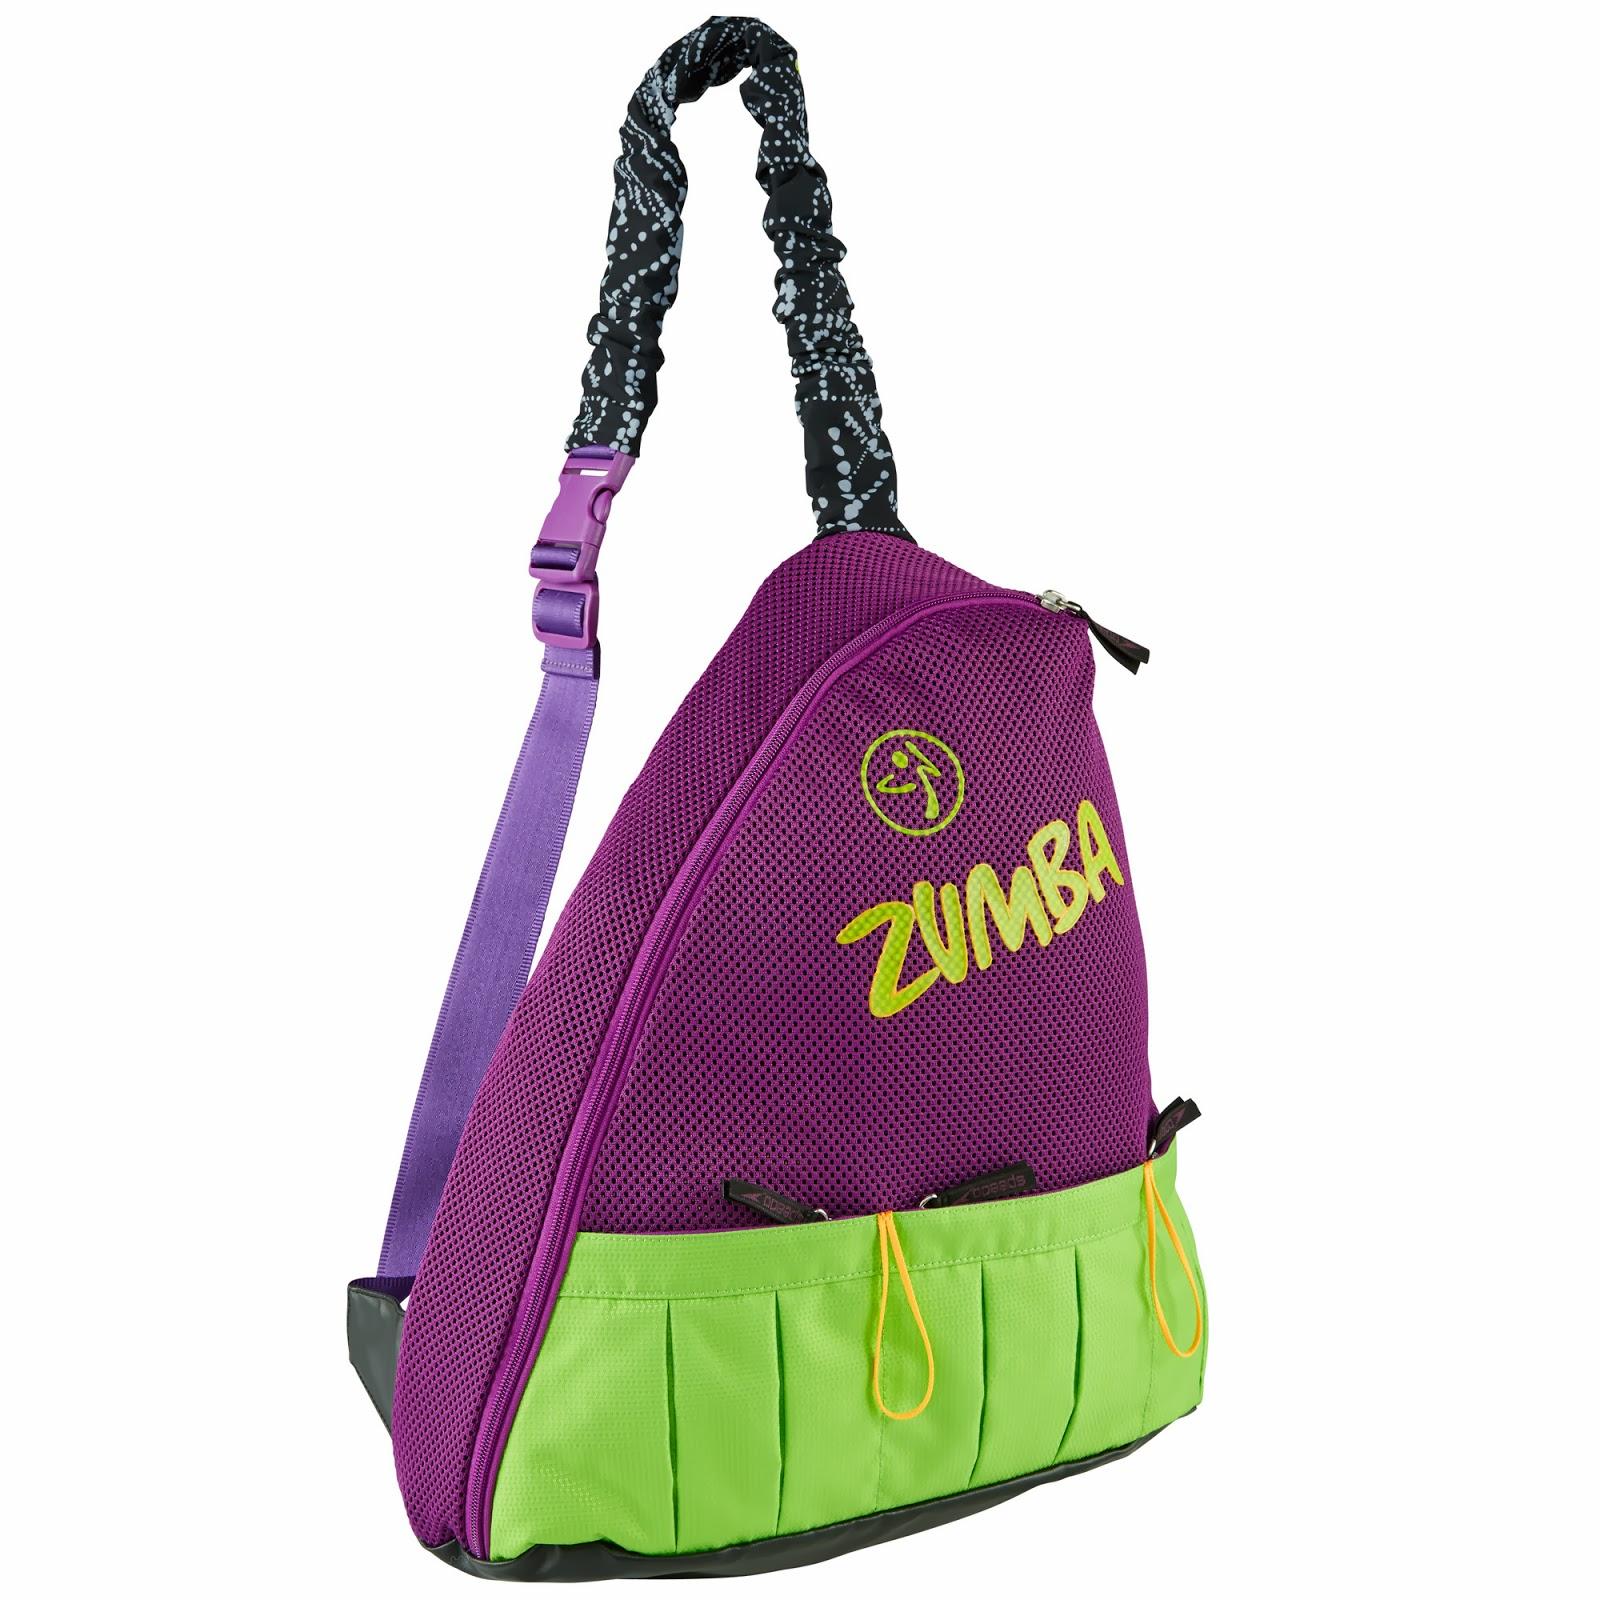 http://www.zumba.com/en-US/store-zin/US/product/funk-phenom-sling-bag?color=Vivid+Violet